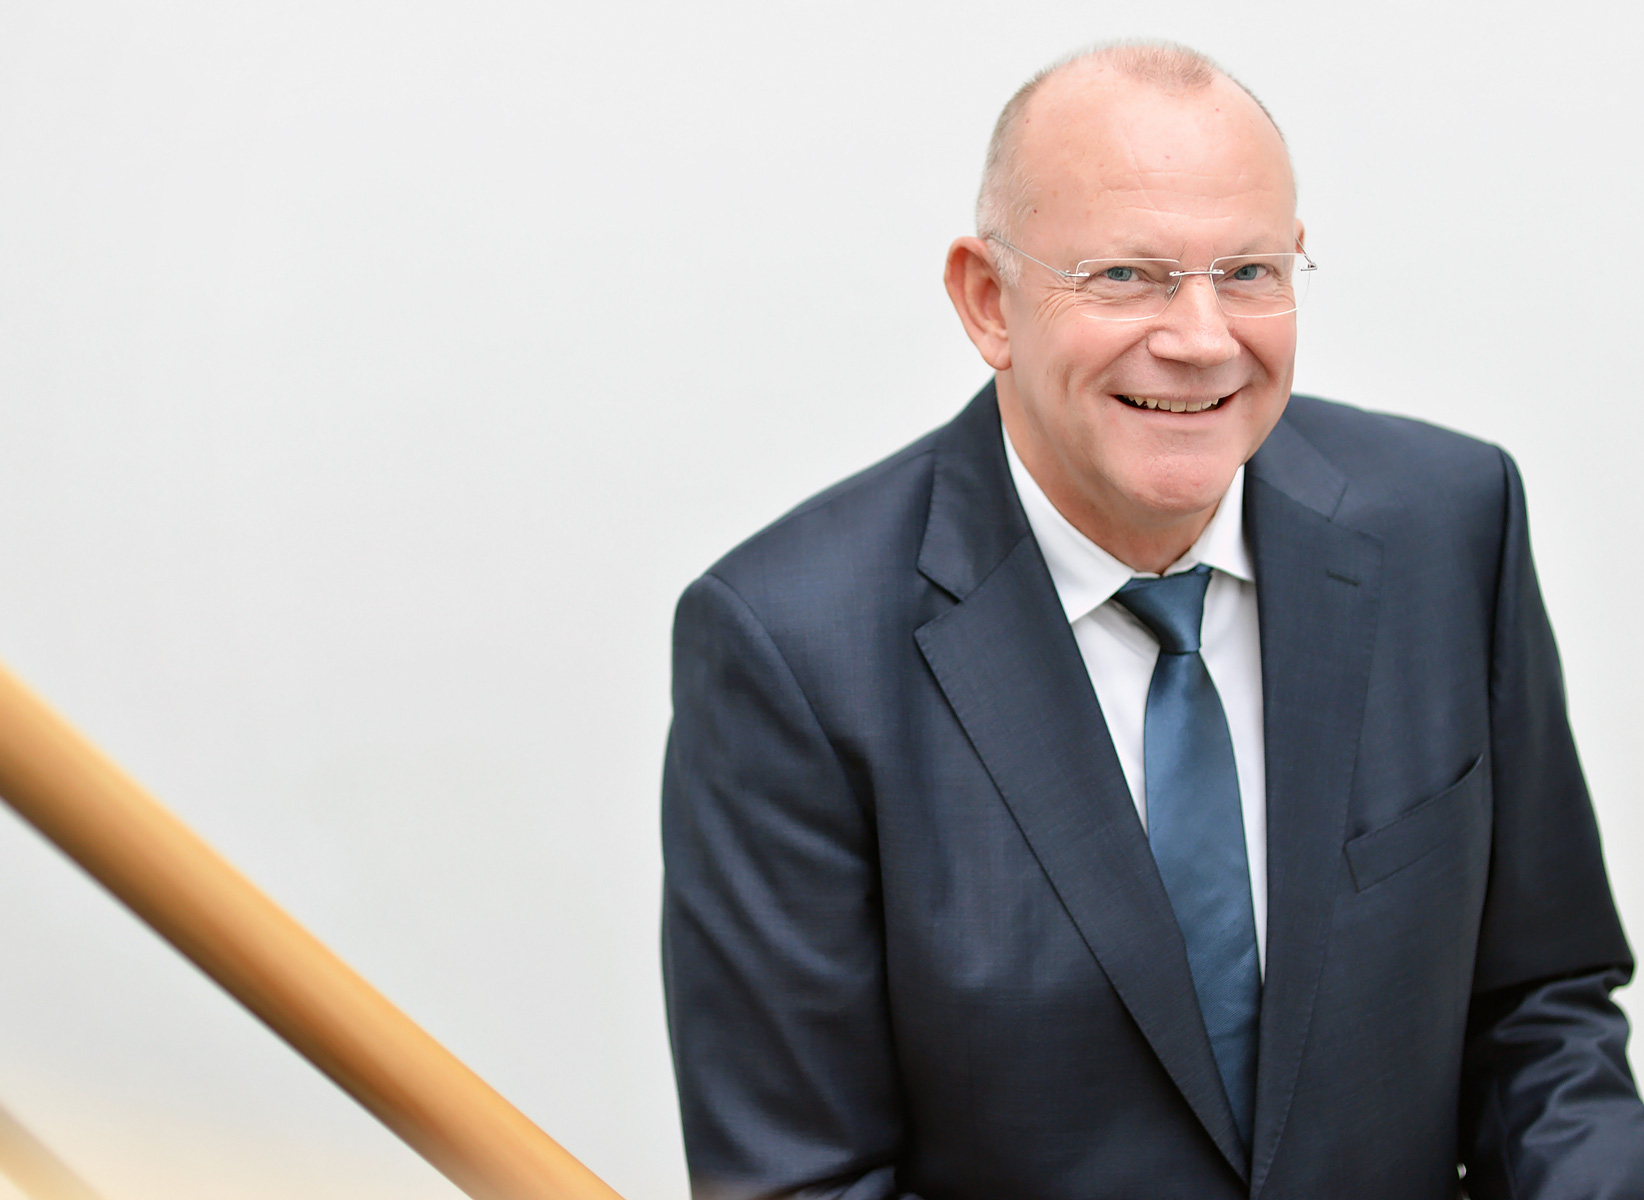 Prof. Dr. Jur. Werner Hecker, Rechtsanwalt